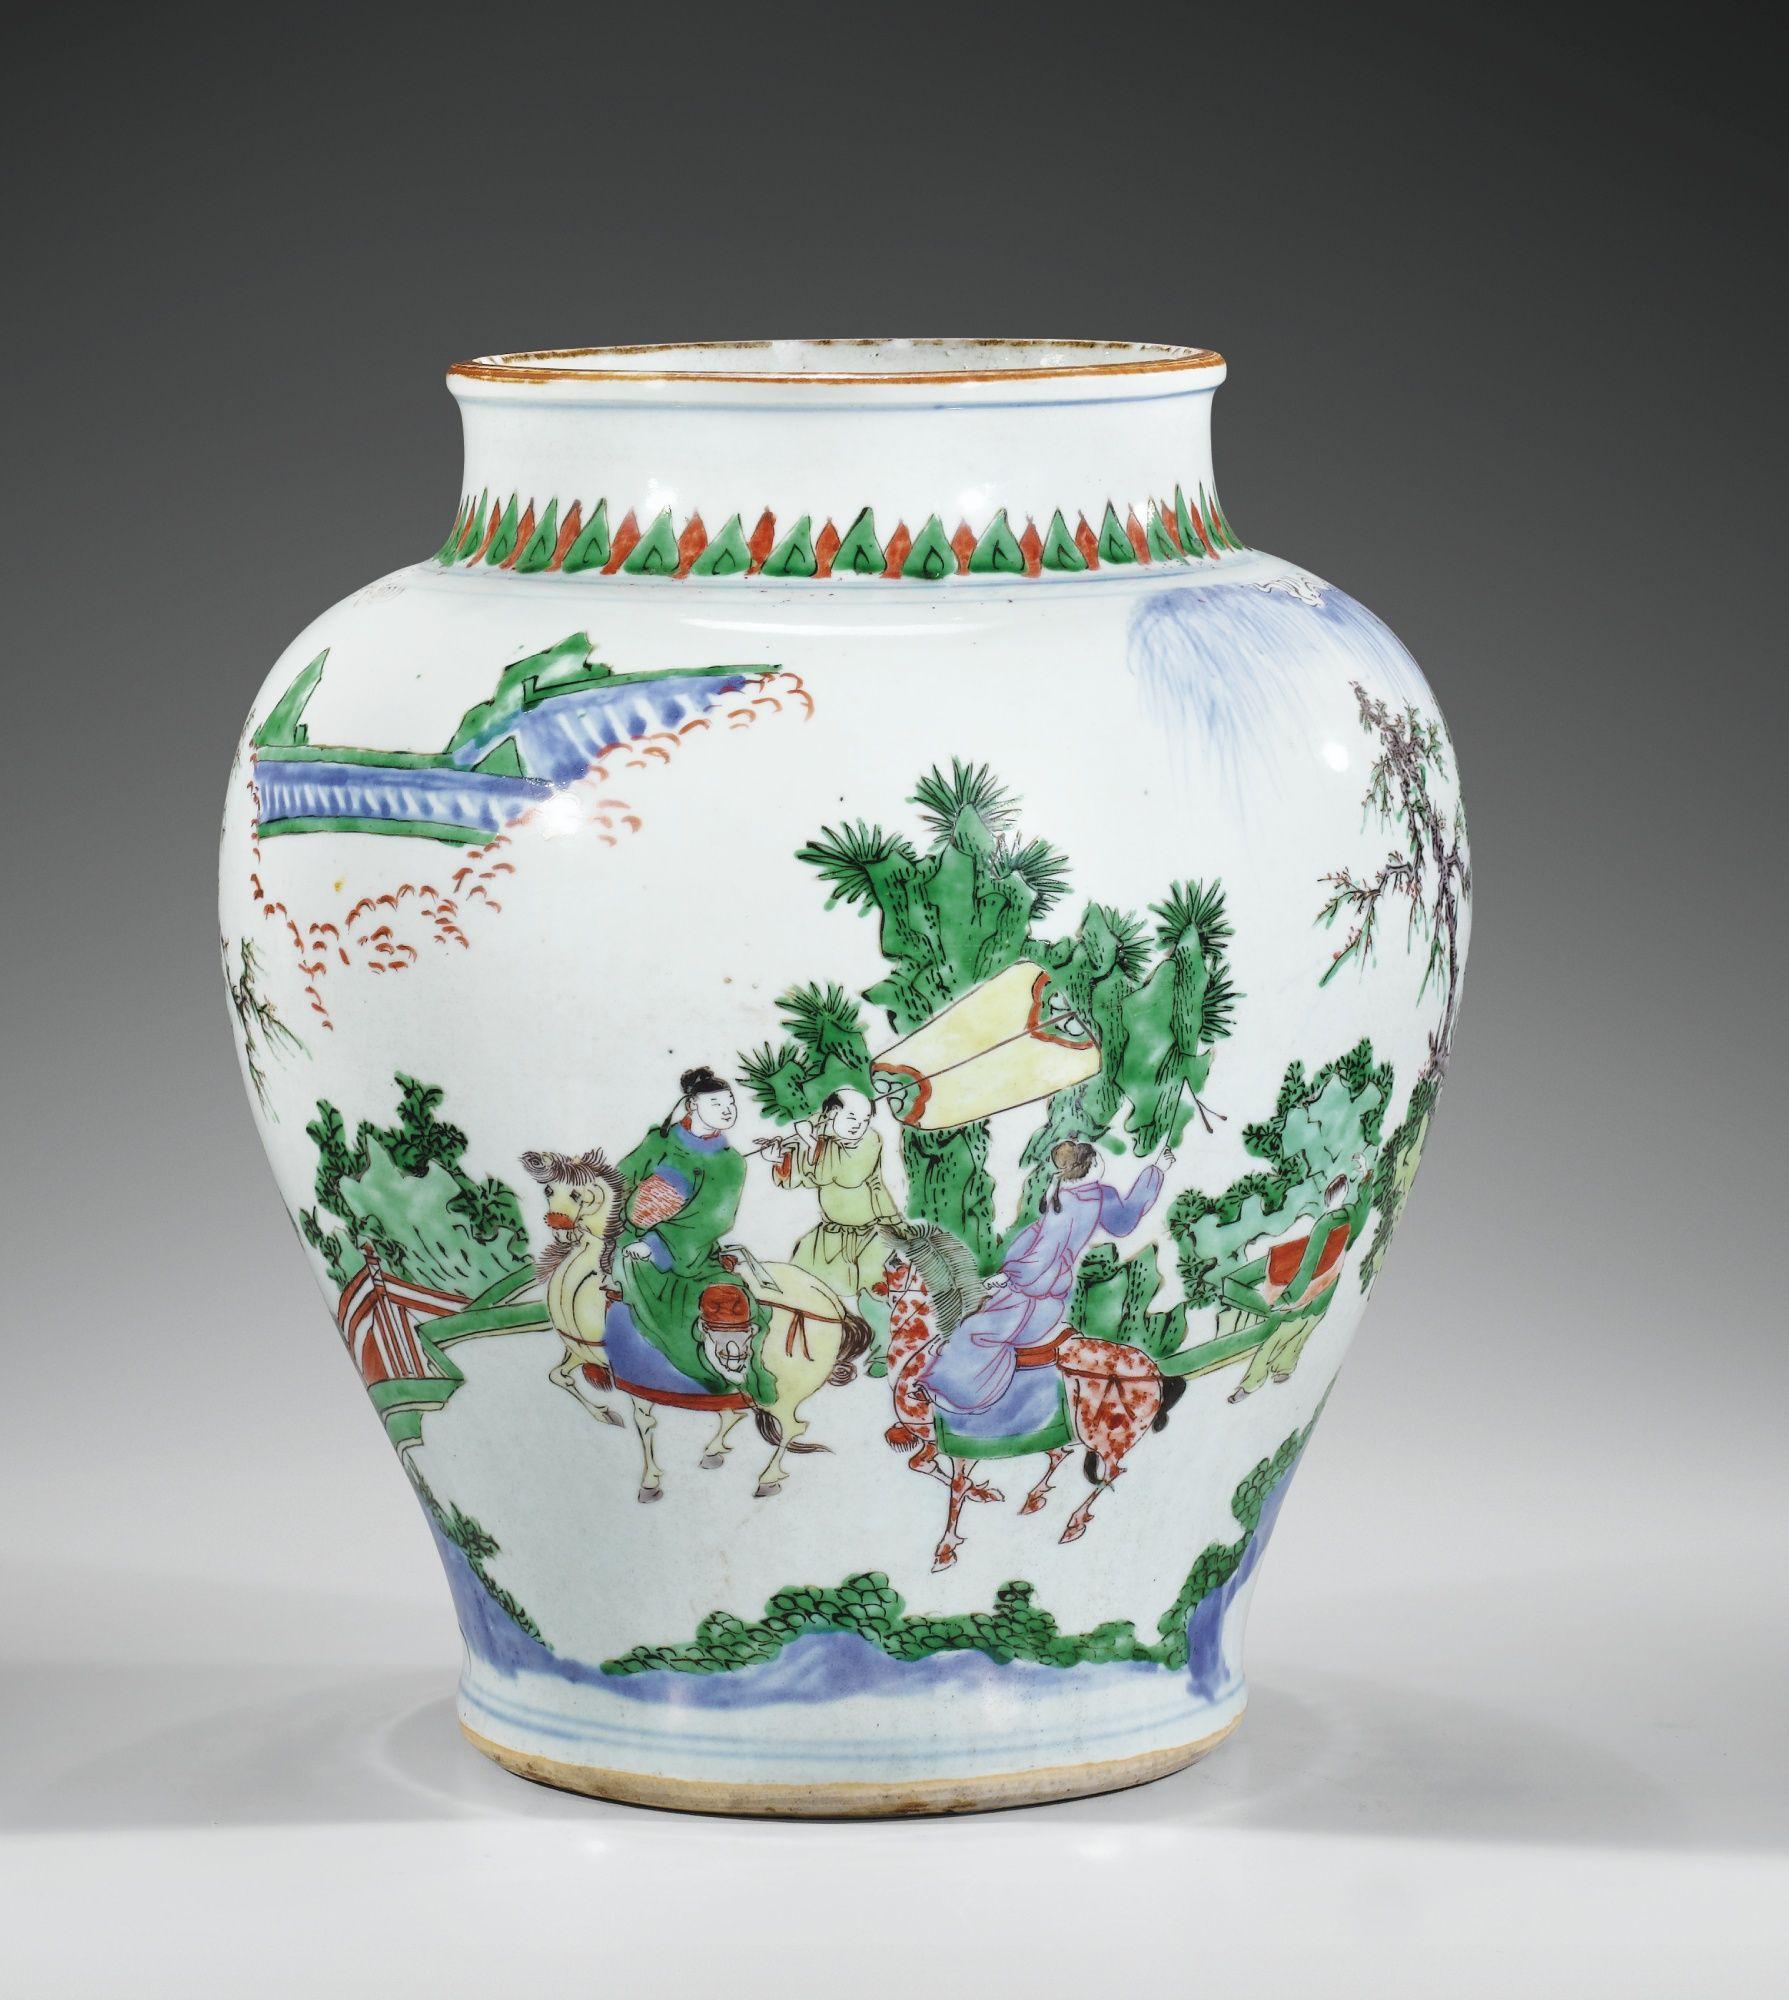 A WUCAI JAR, QING DYNASTY, KANGXI PERIOD 37,8 cm